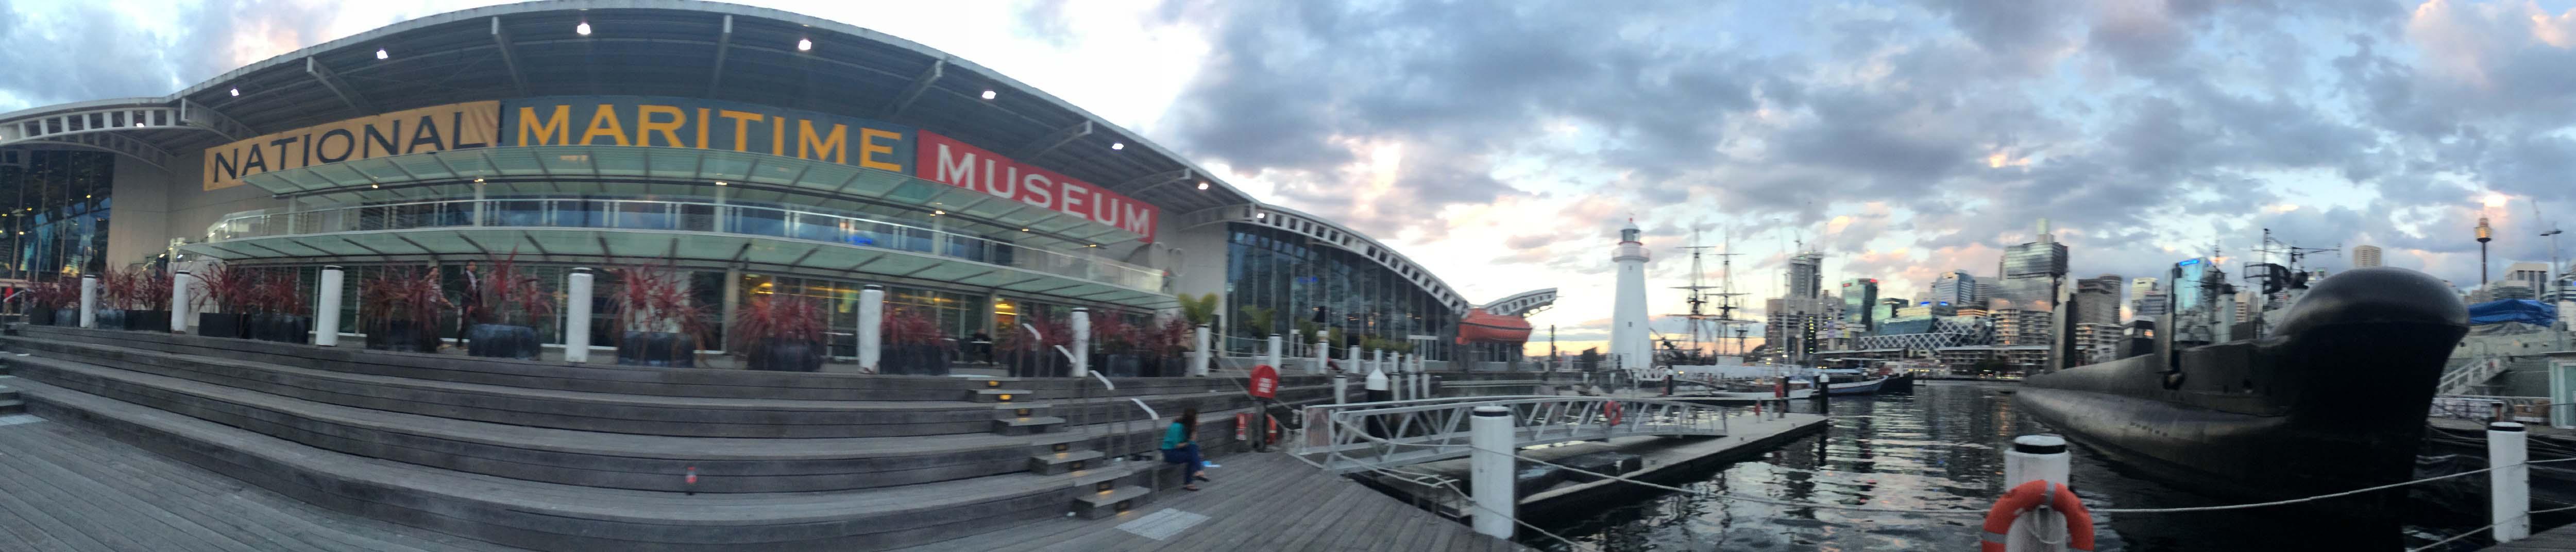 01 Australian National Maritime Museum Darling Harbour, Sydney